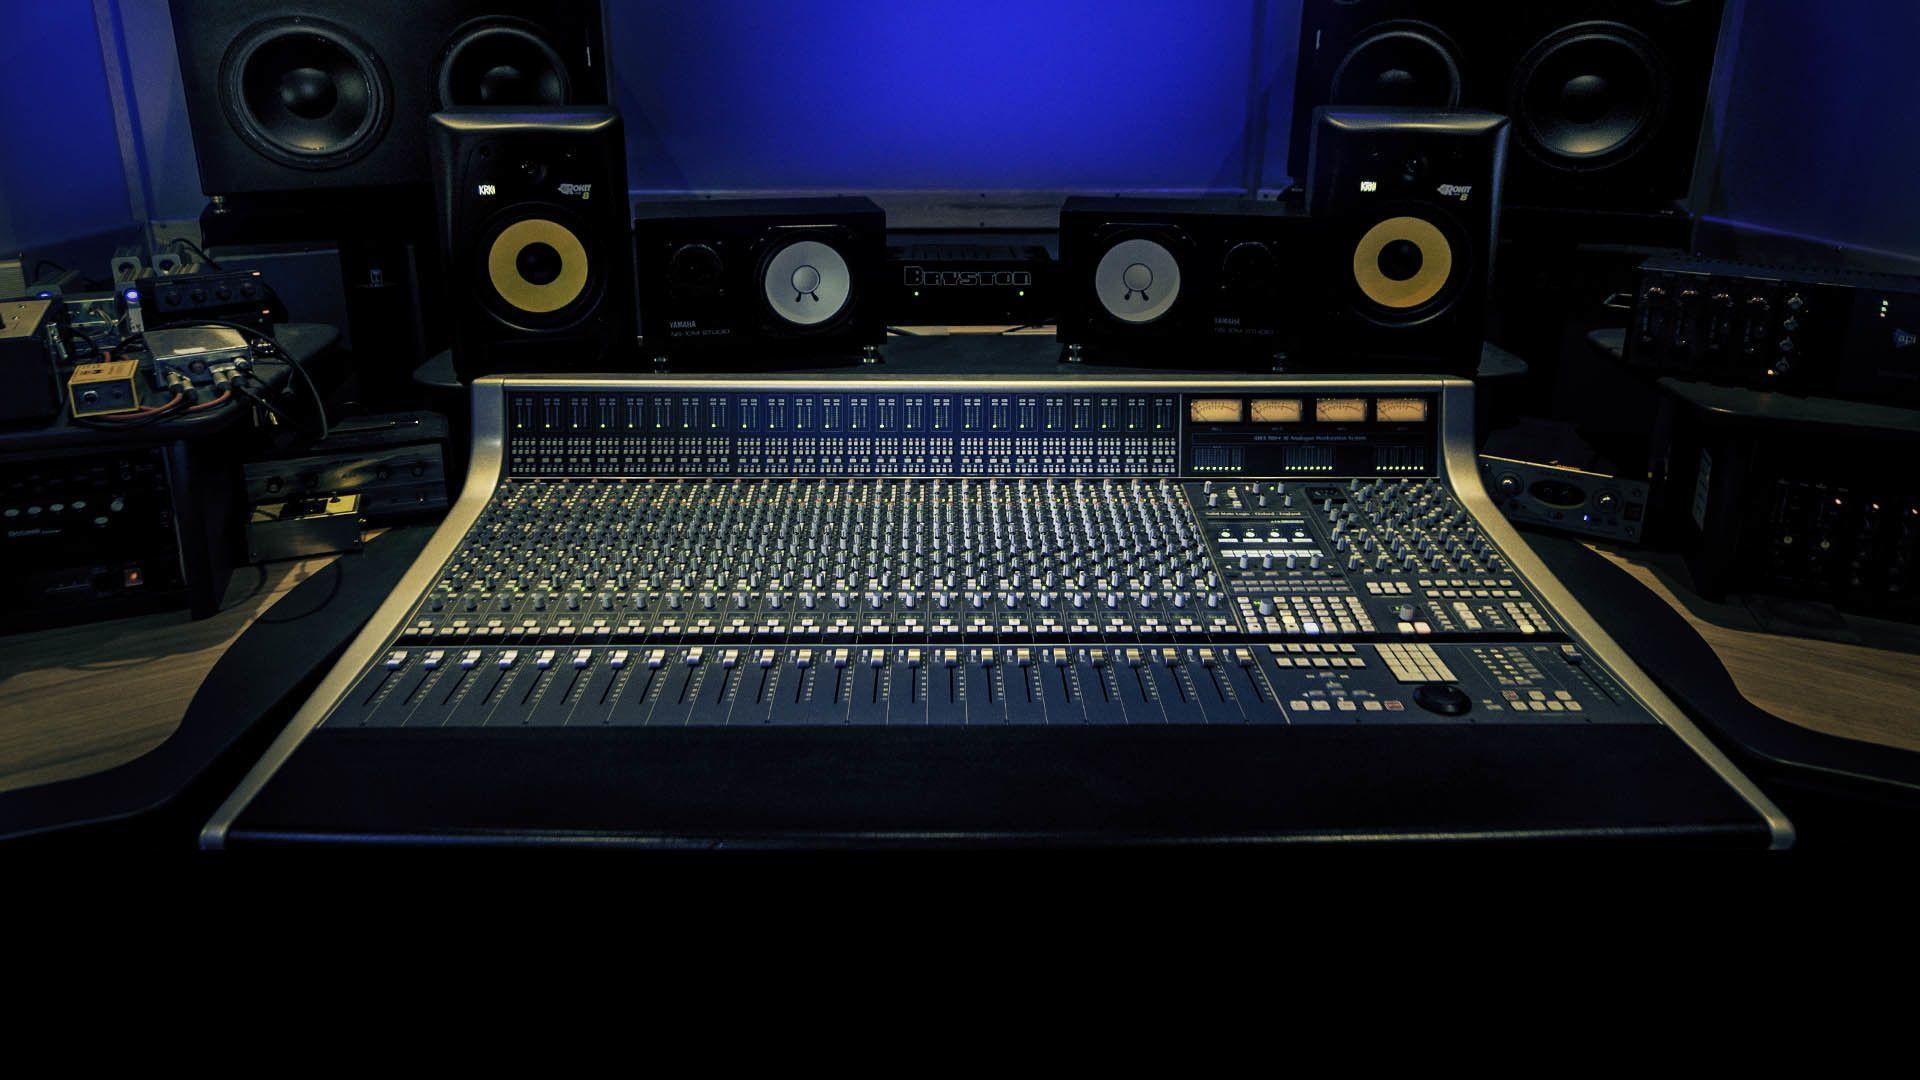 Recording Studio Wallpapers Top Free Recording Studio Backgrounds Wallpaperaccess